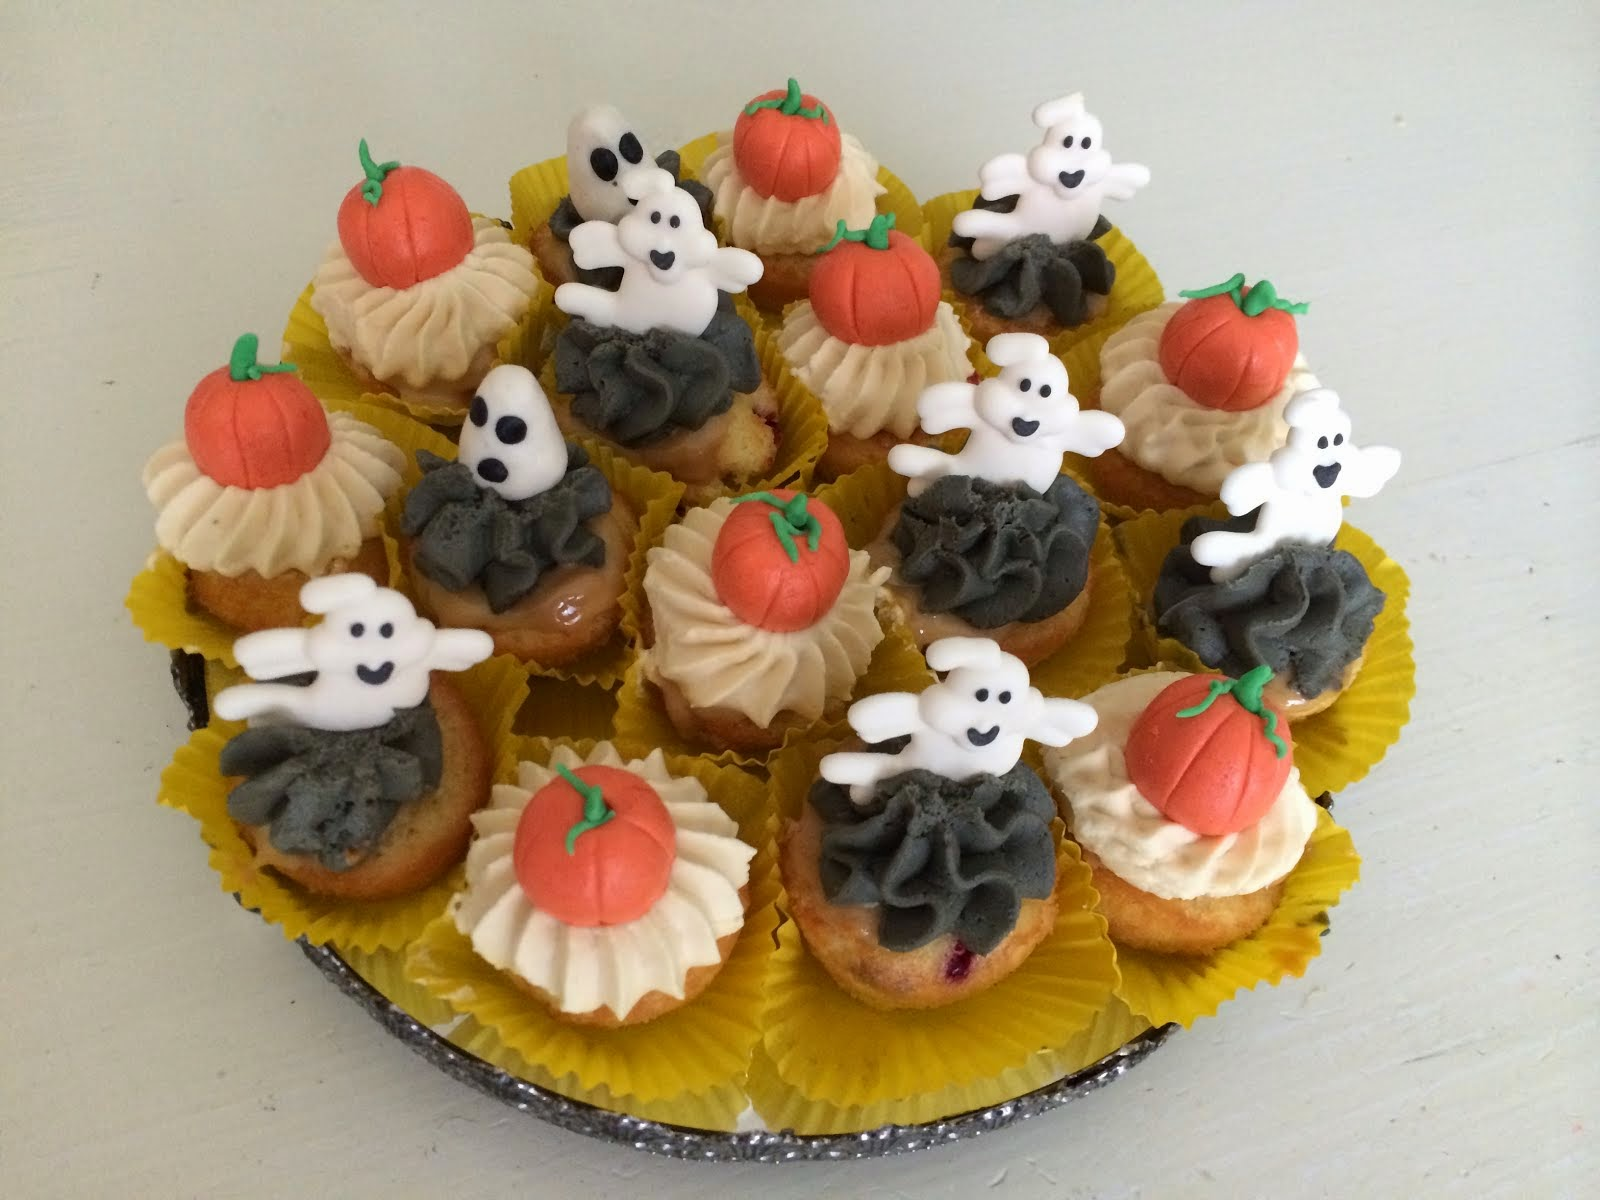 Halloweencupcakes med lakrits hallon och dulce de leche